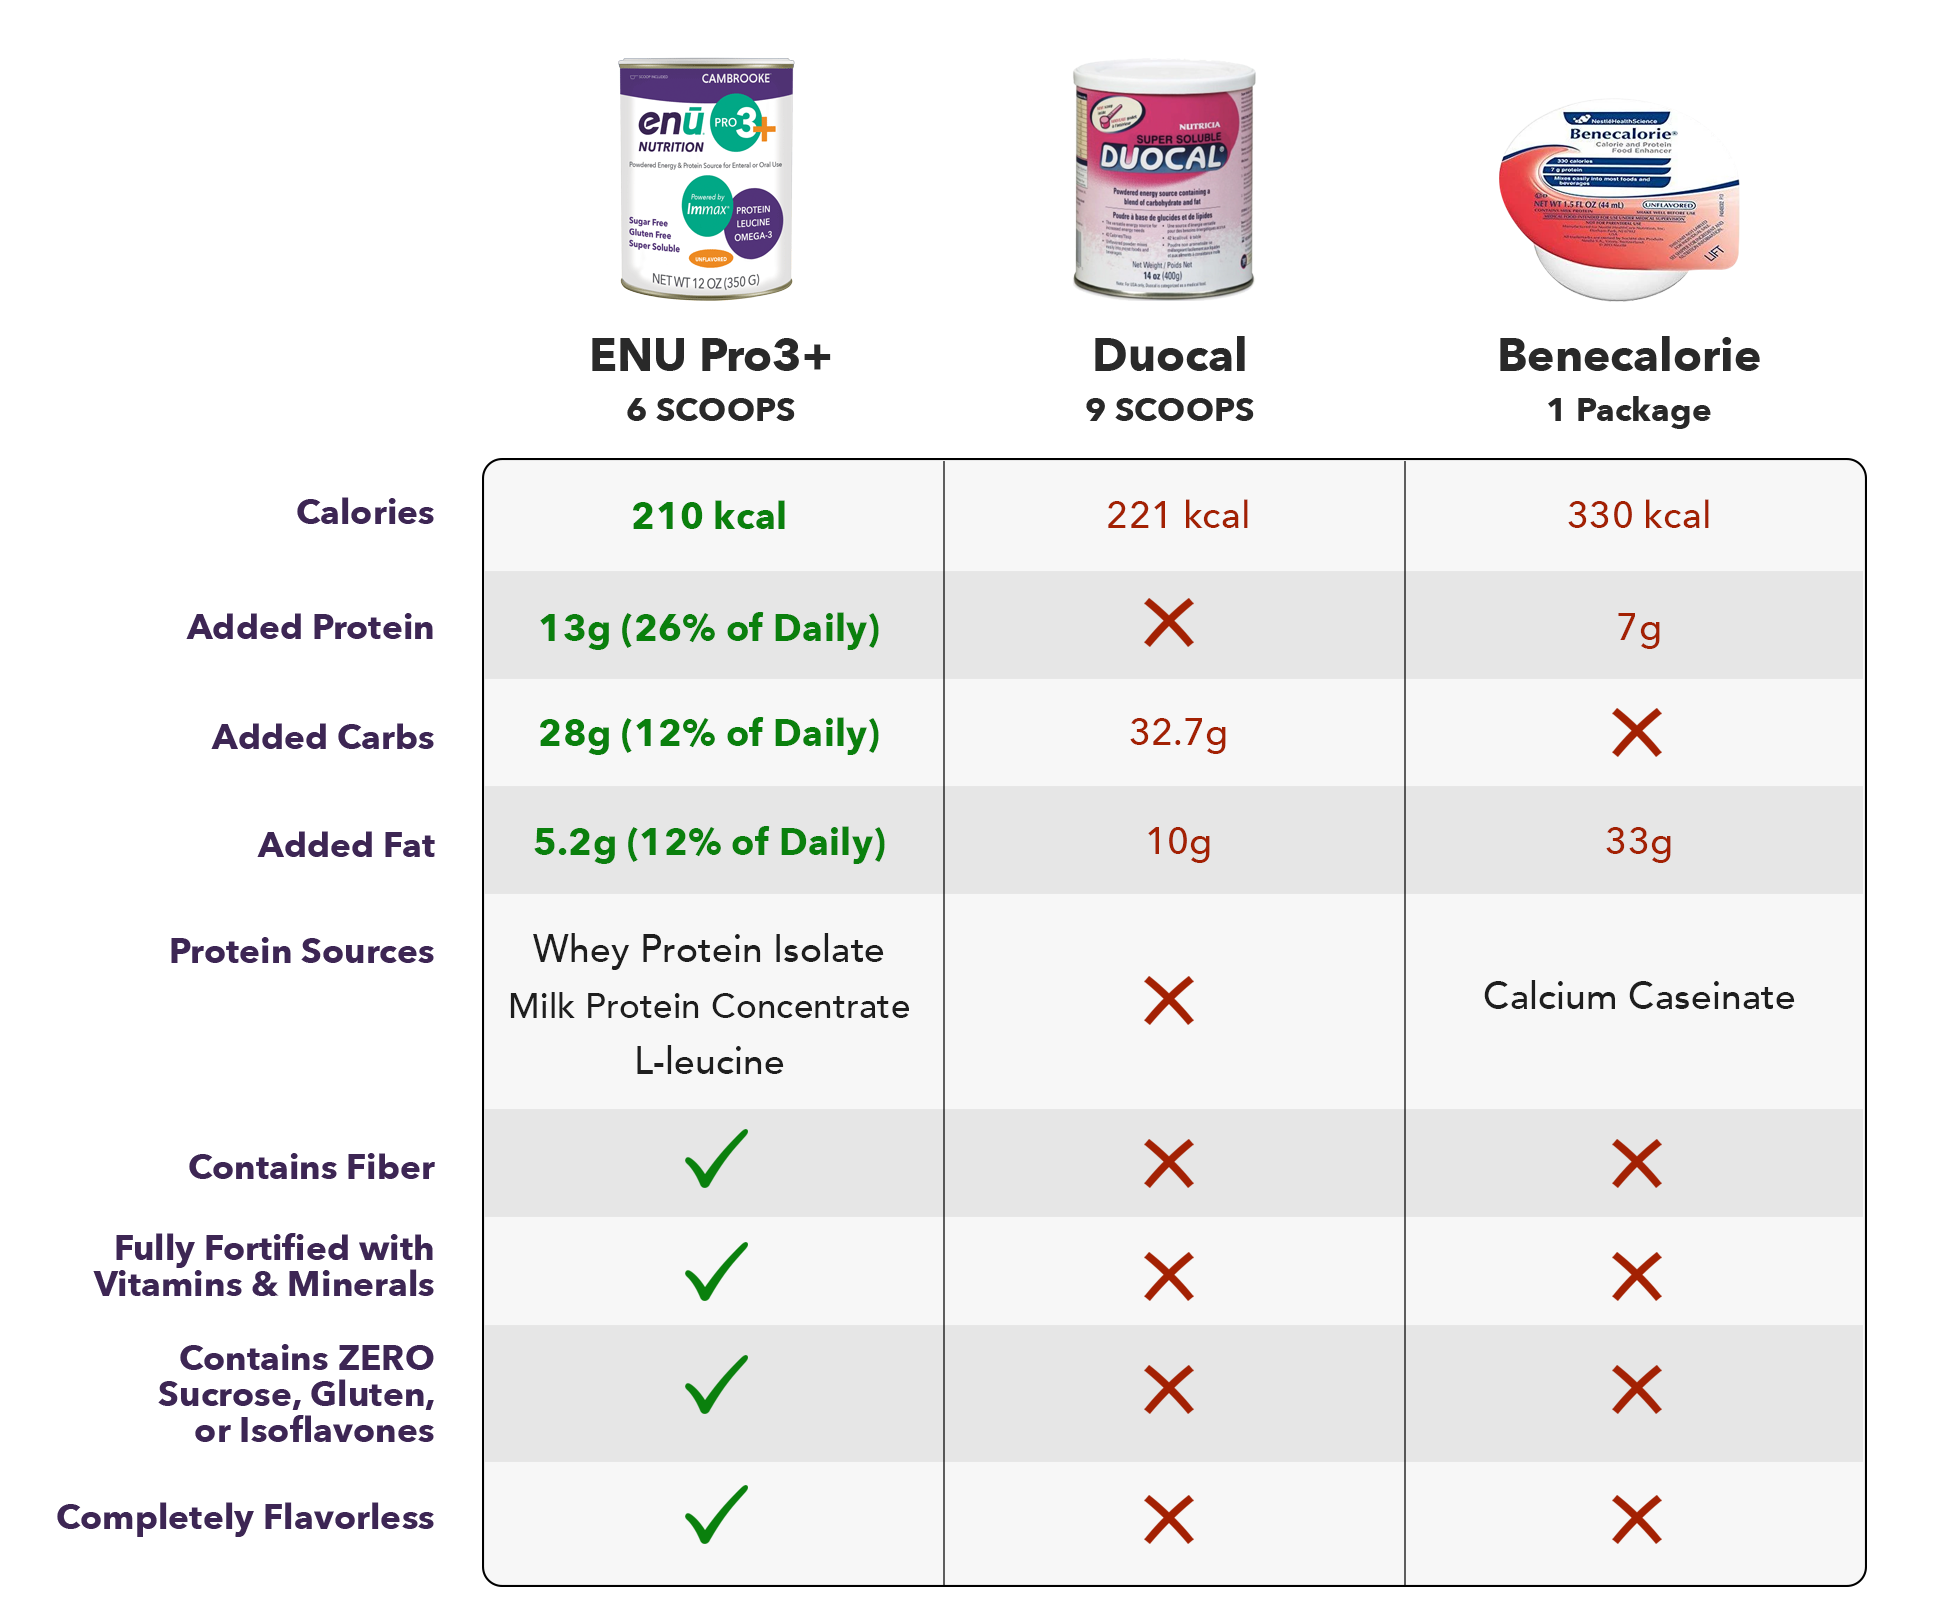 comparison chart duocal benecalorie - Compare ENU